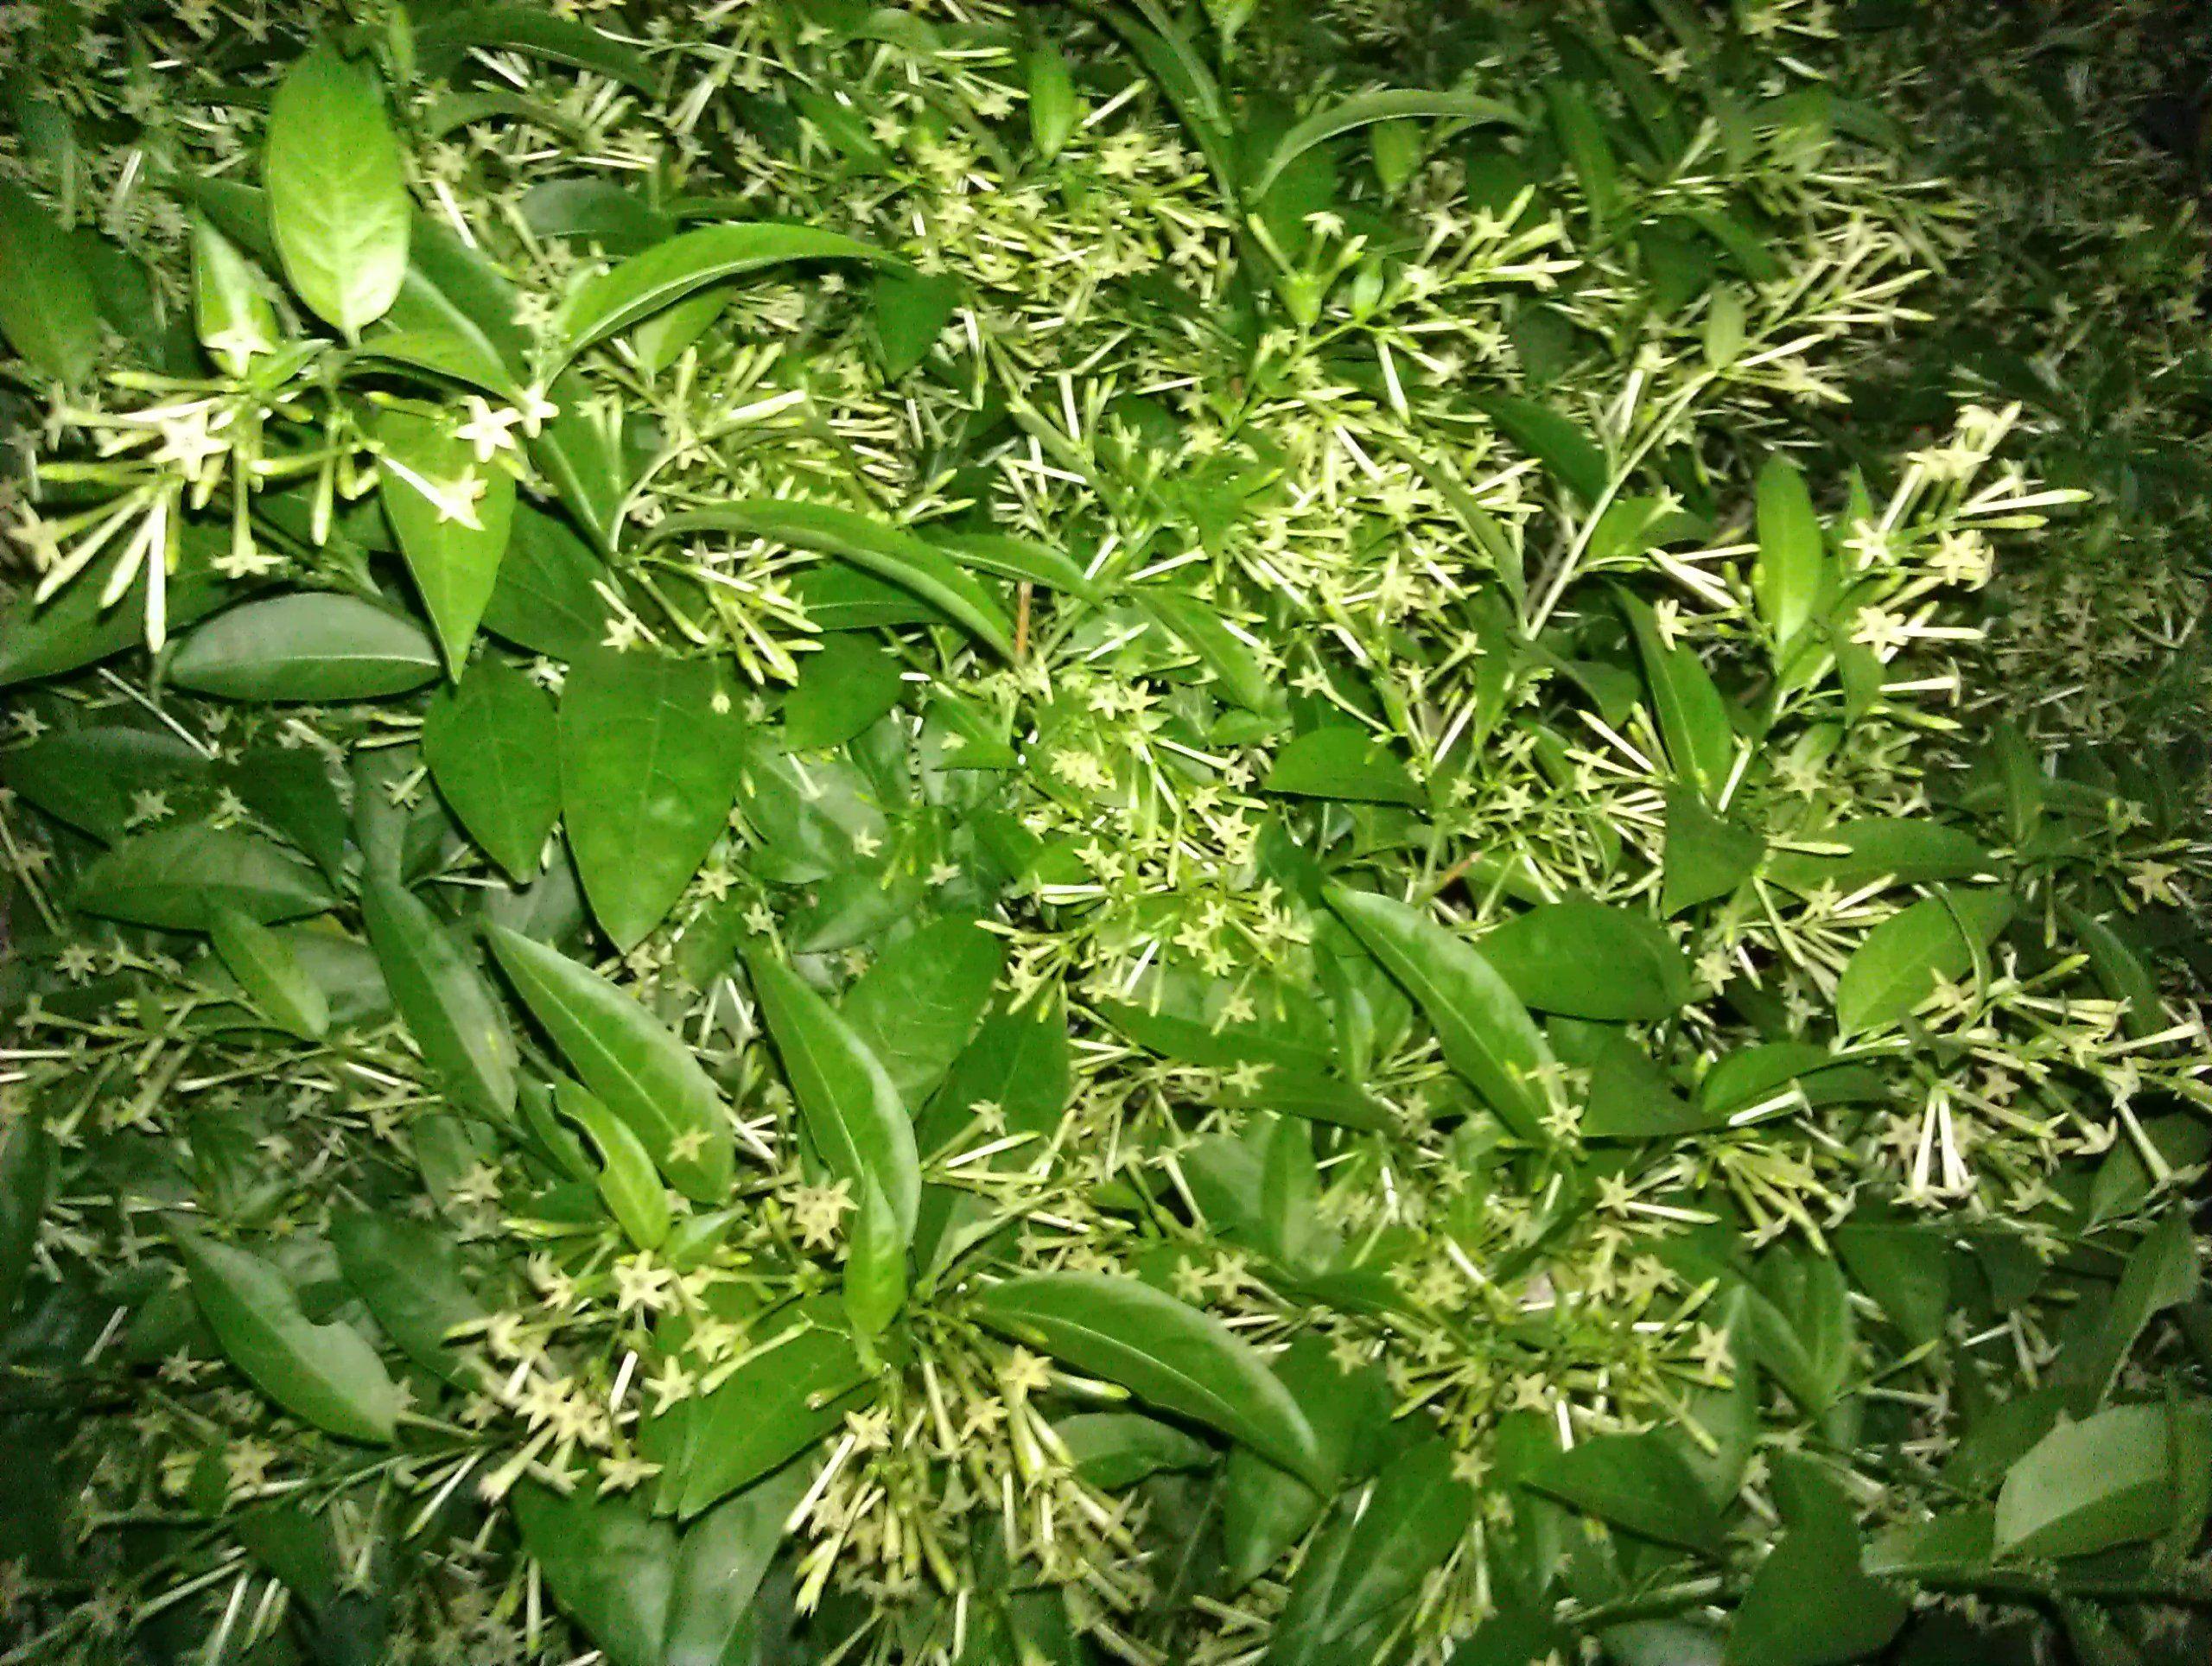 Amazon night blooming jasmine plant cestrum nocturnum 4 amazon night blooming jasmine plant cestrum nocturnum 4 pot house plants patio lawn garden izmirmasajfo